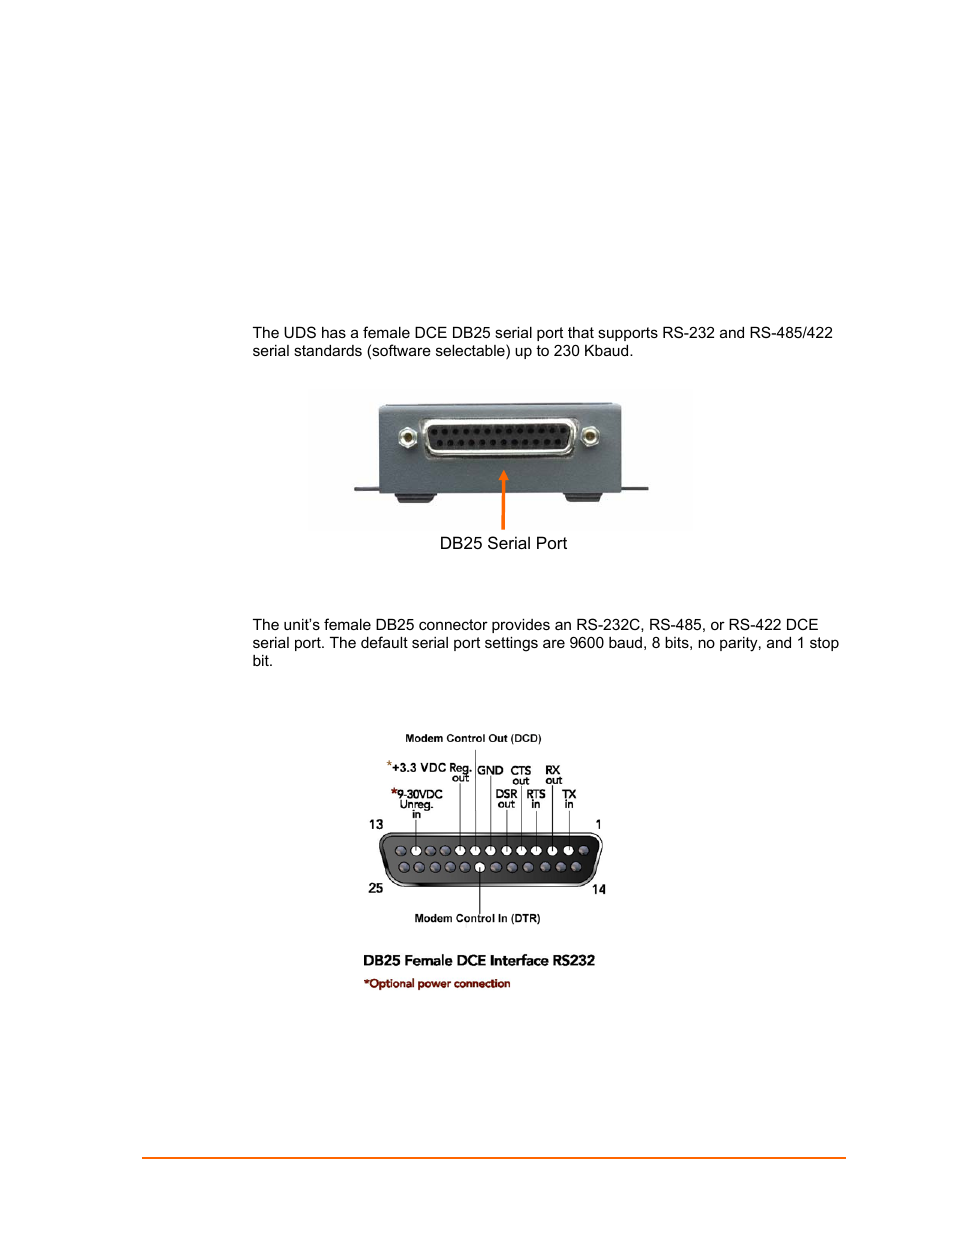 Serial Plug Pinout Cisco Rj45 E1 Diagram Pinoutsru Connections And Pinouts Port Connector Lantronix Uds User Manual Page 954x1235